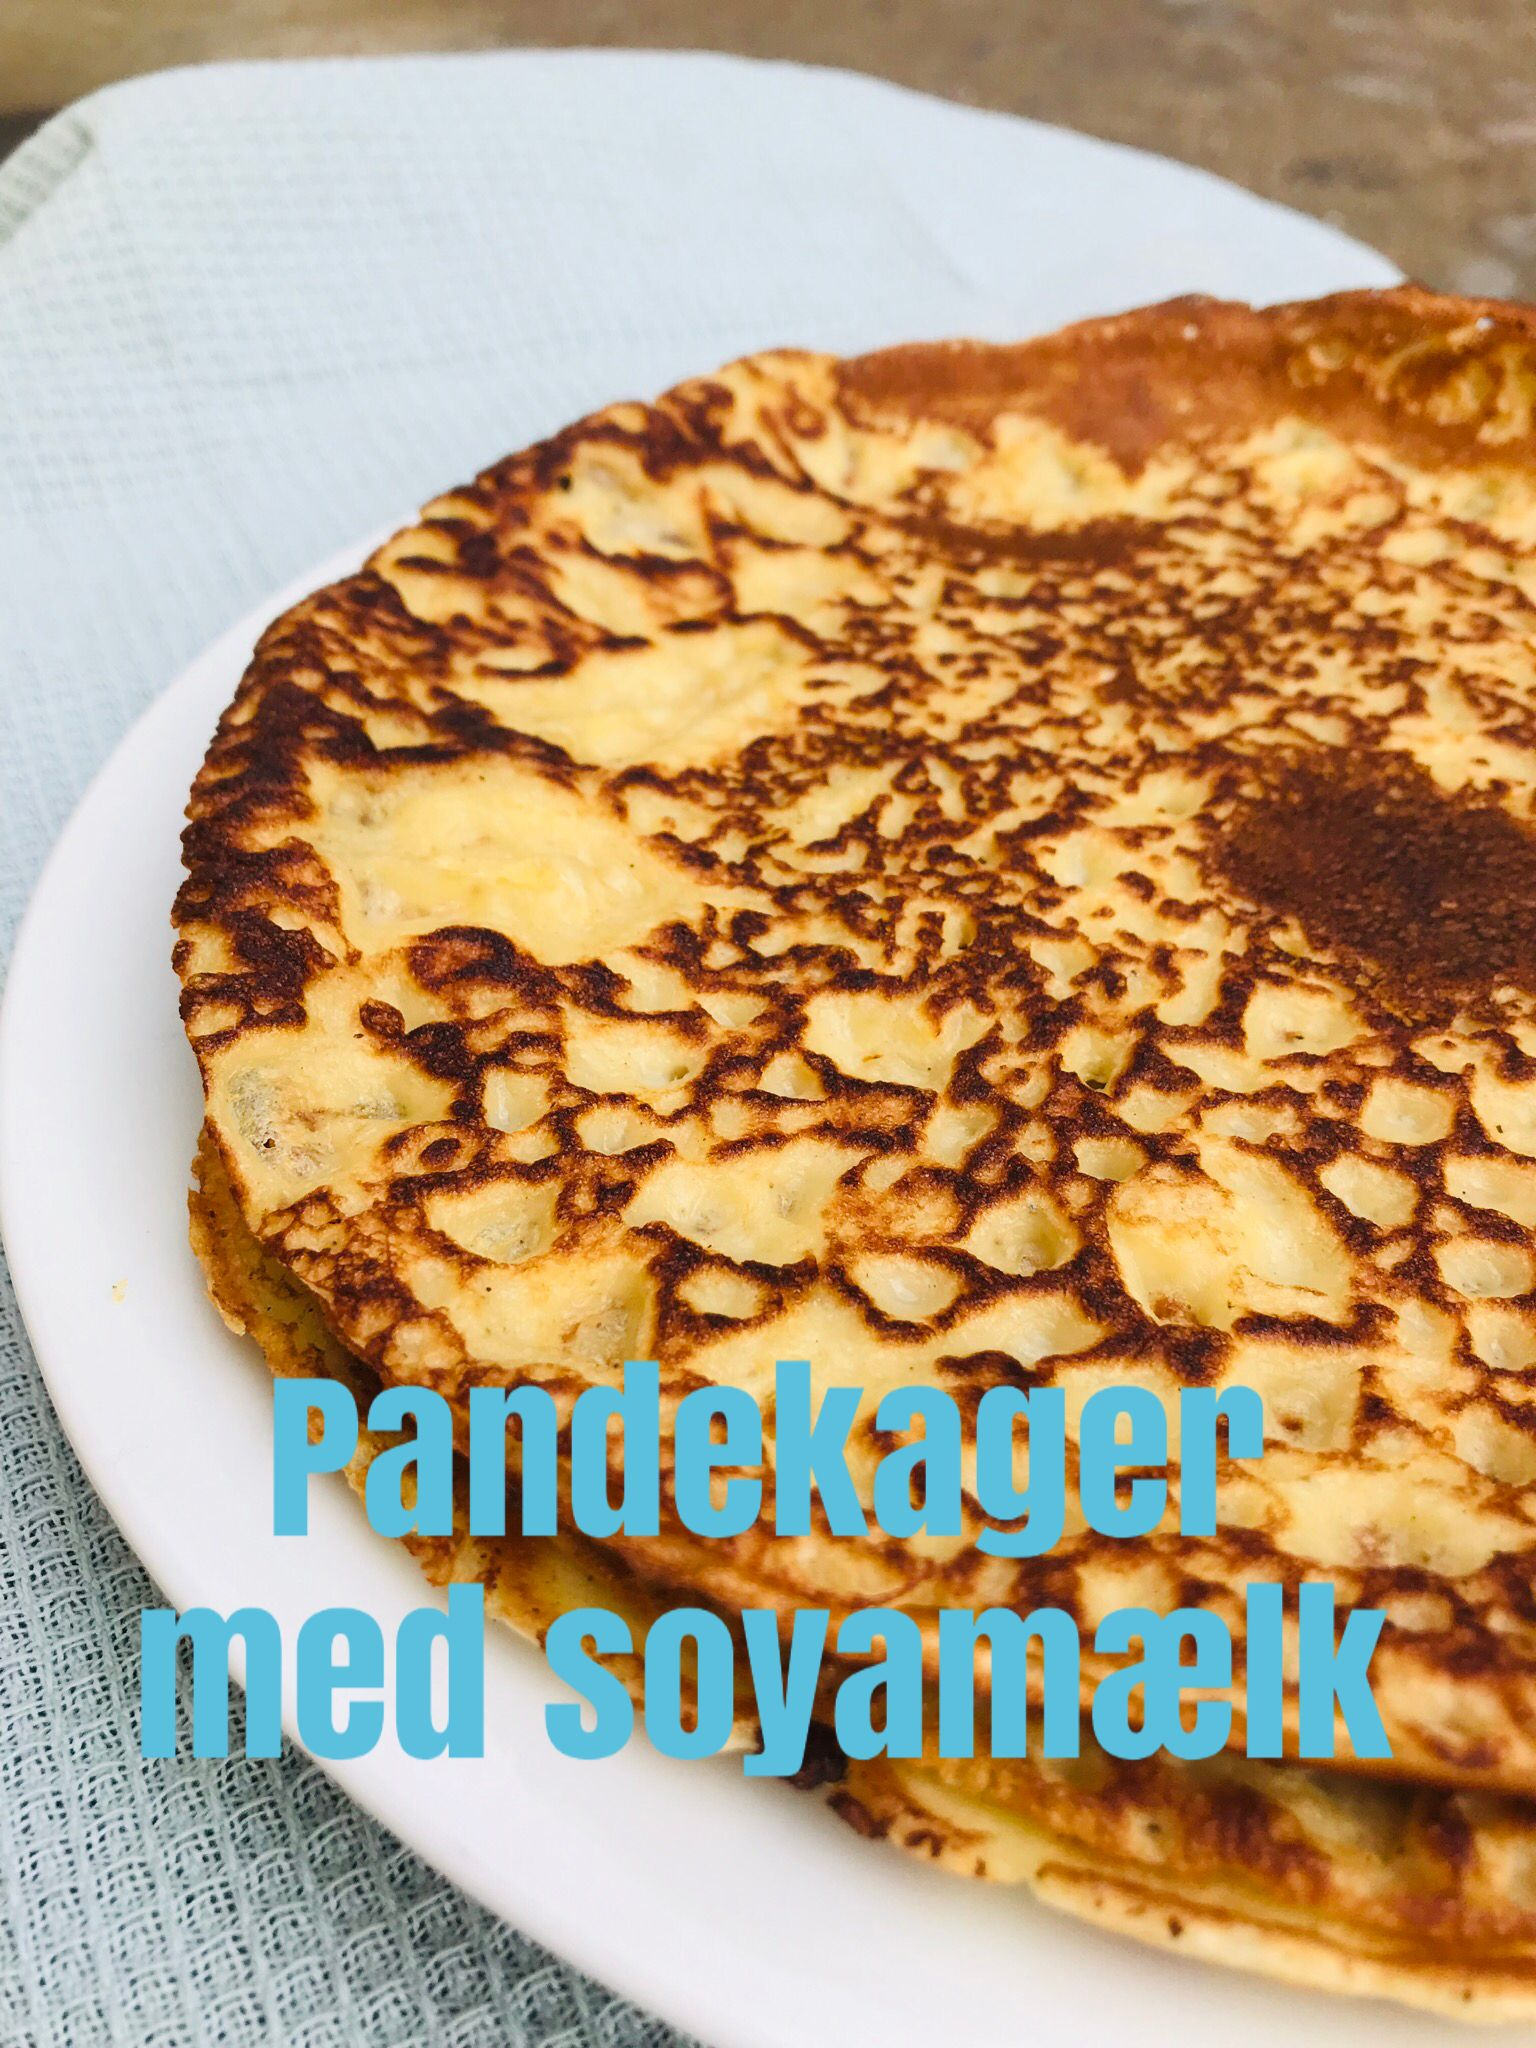 Pandekager Med Soyamælk Opskrift Benedictesmaddk Banana Bread